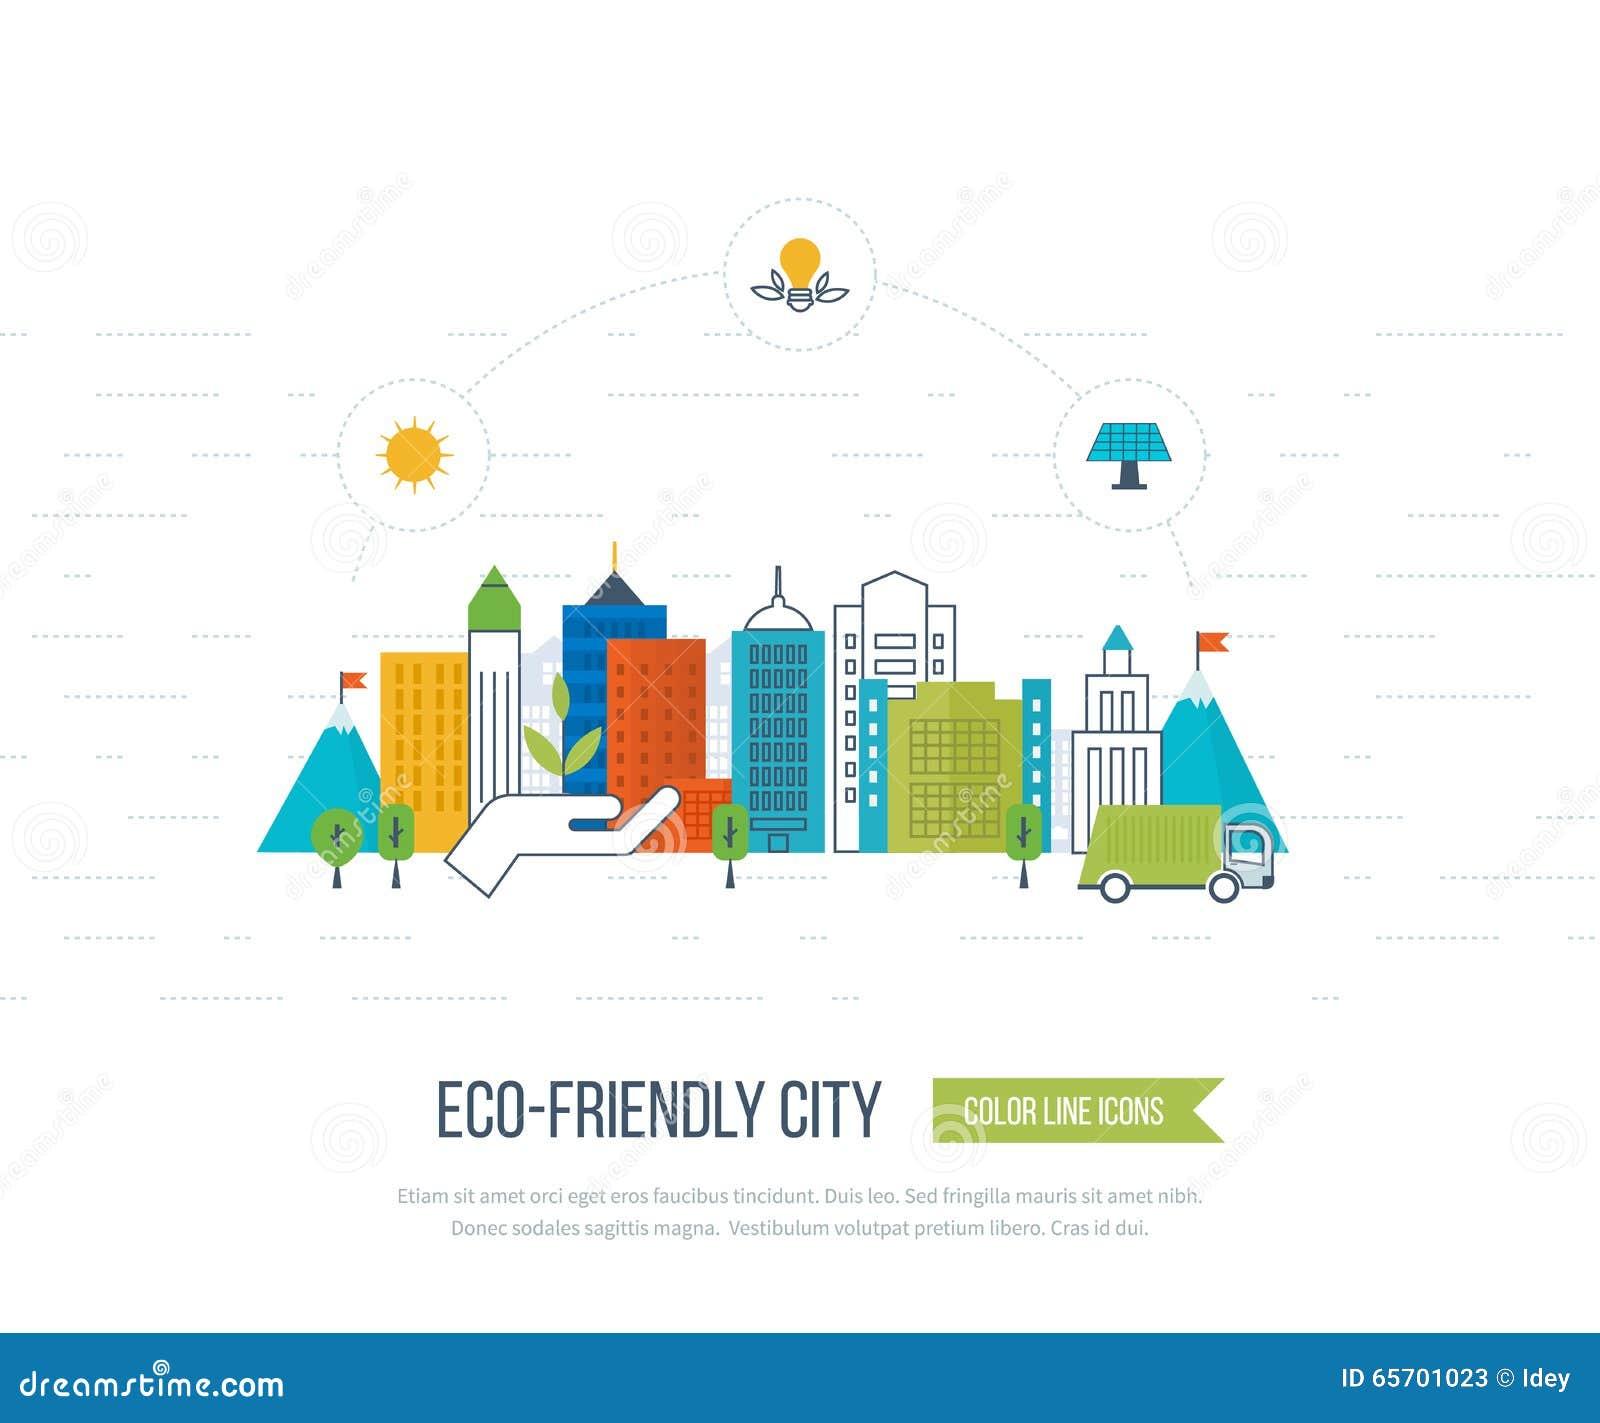 Environmental Concept Earthfriendly Landscapes: Green Eco And Eco-friendly City Concept. Stock Vector